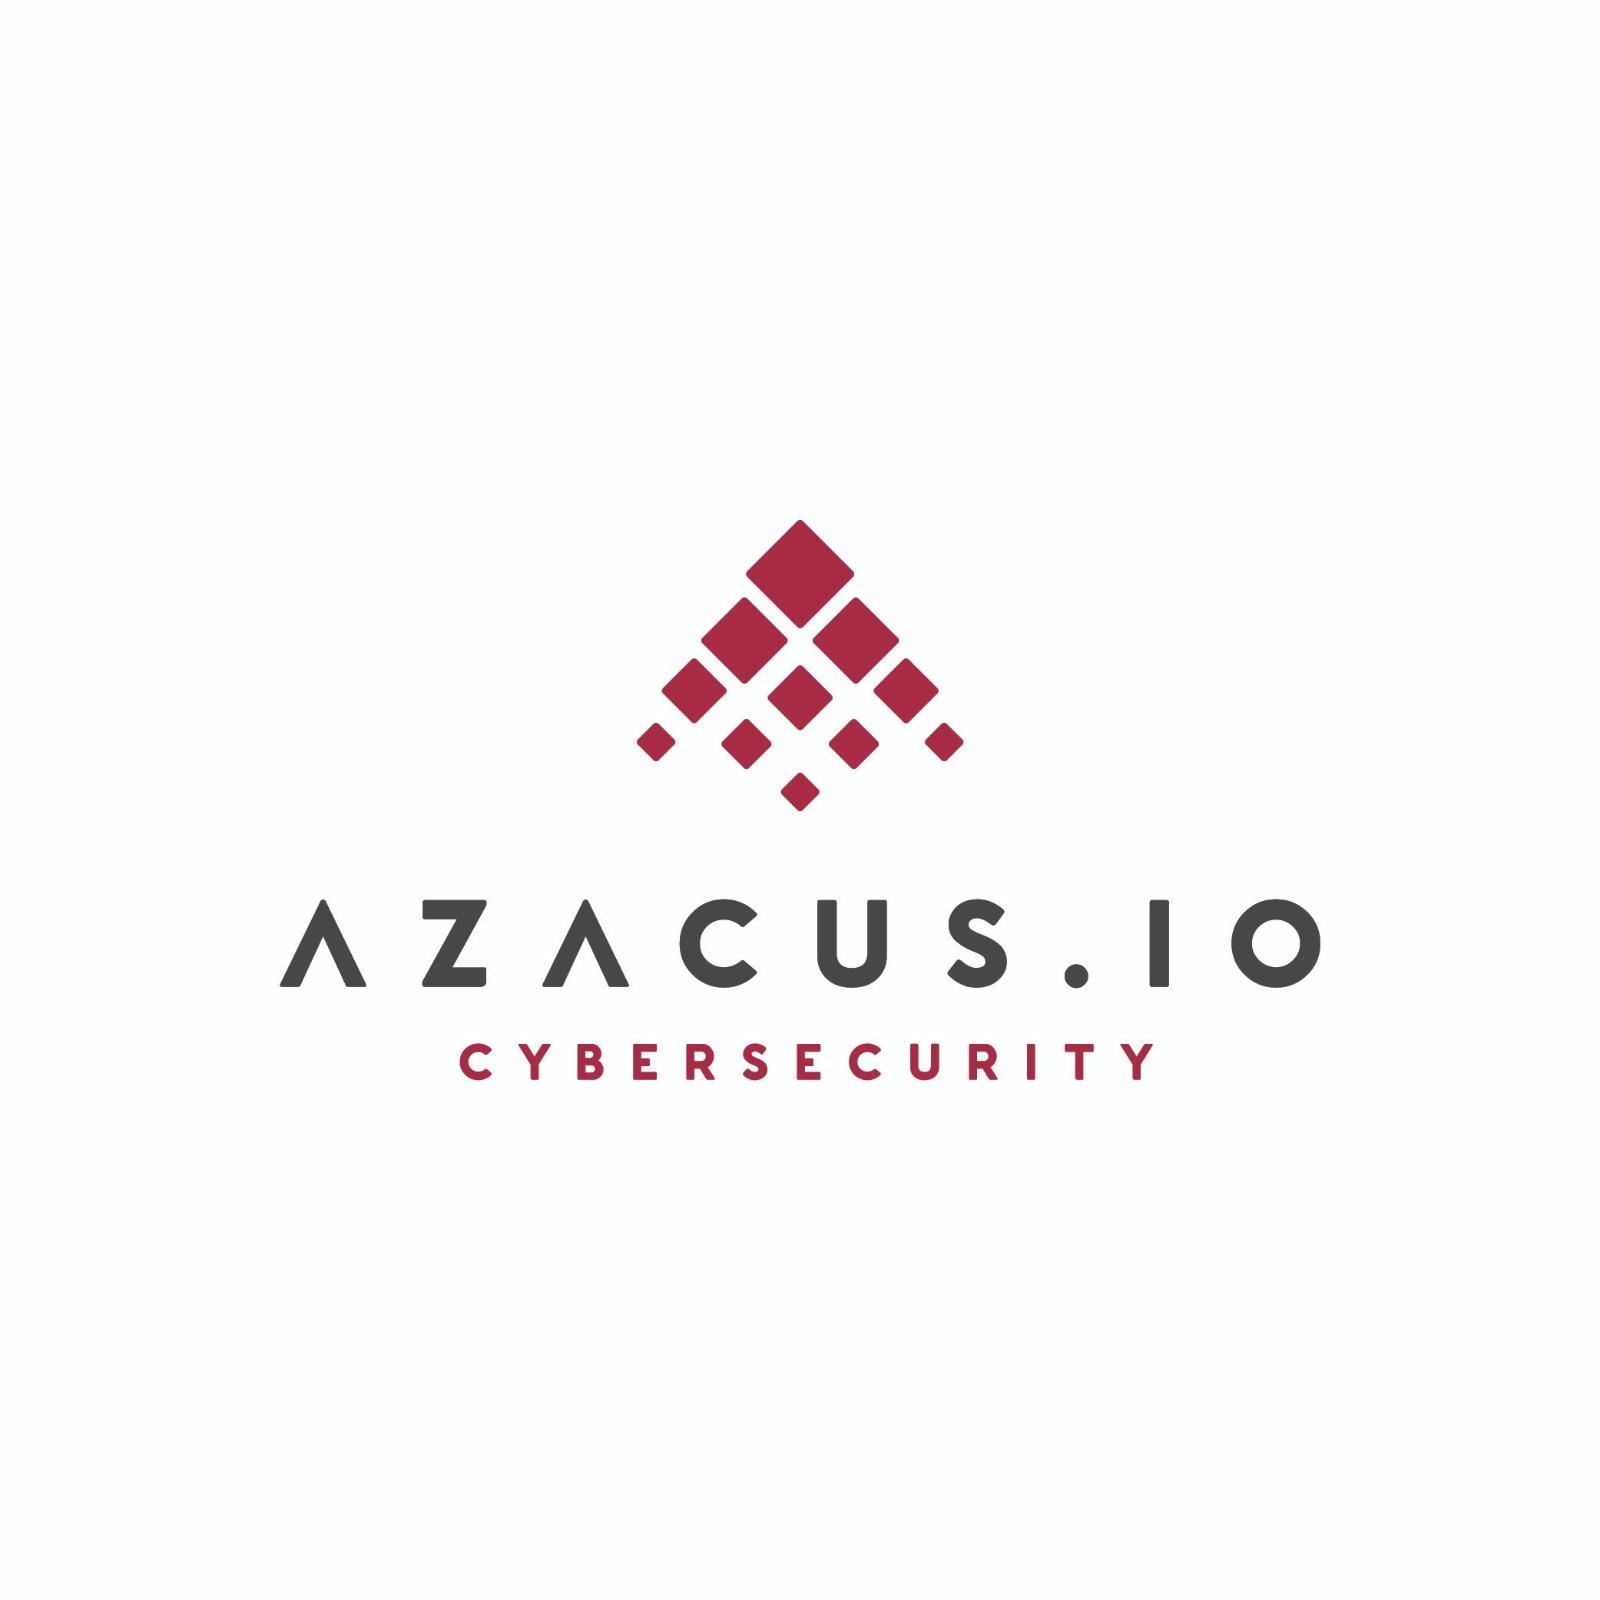 Logo de Azacus.io, ciberseguridad